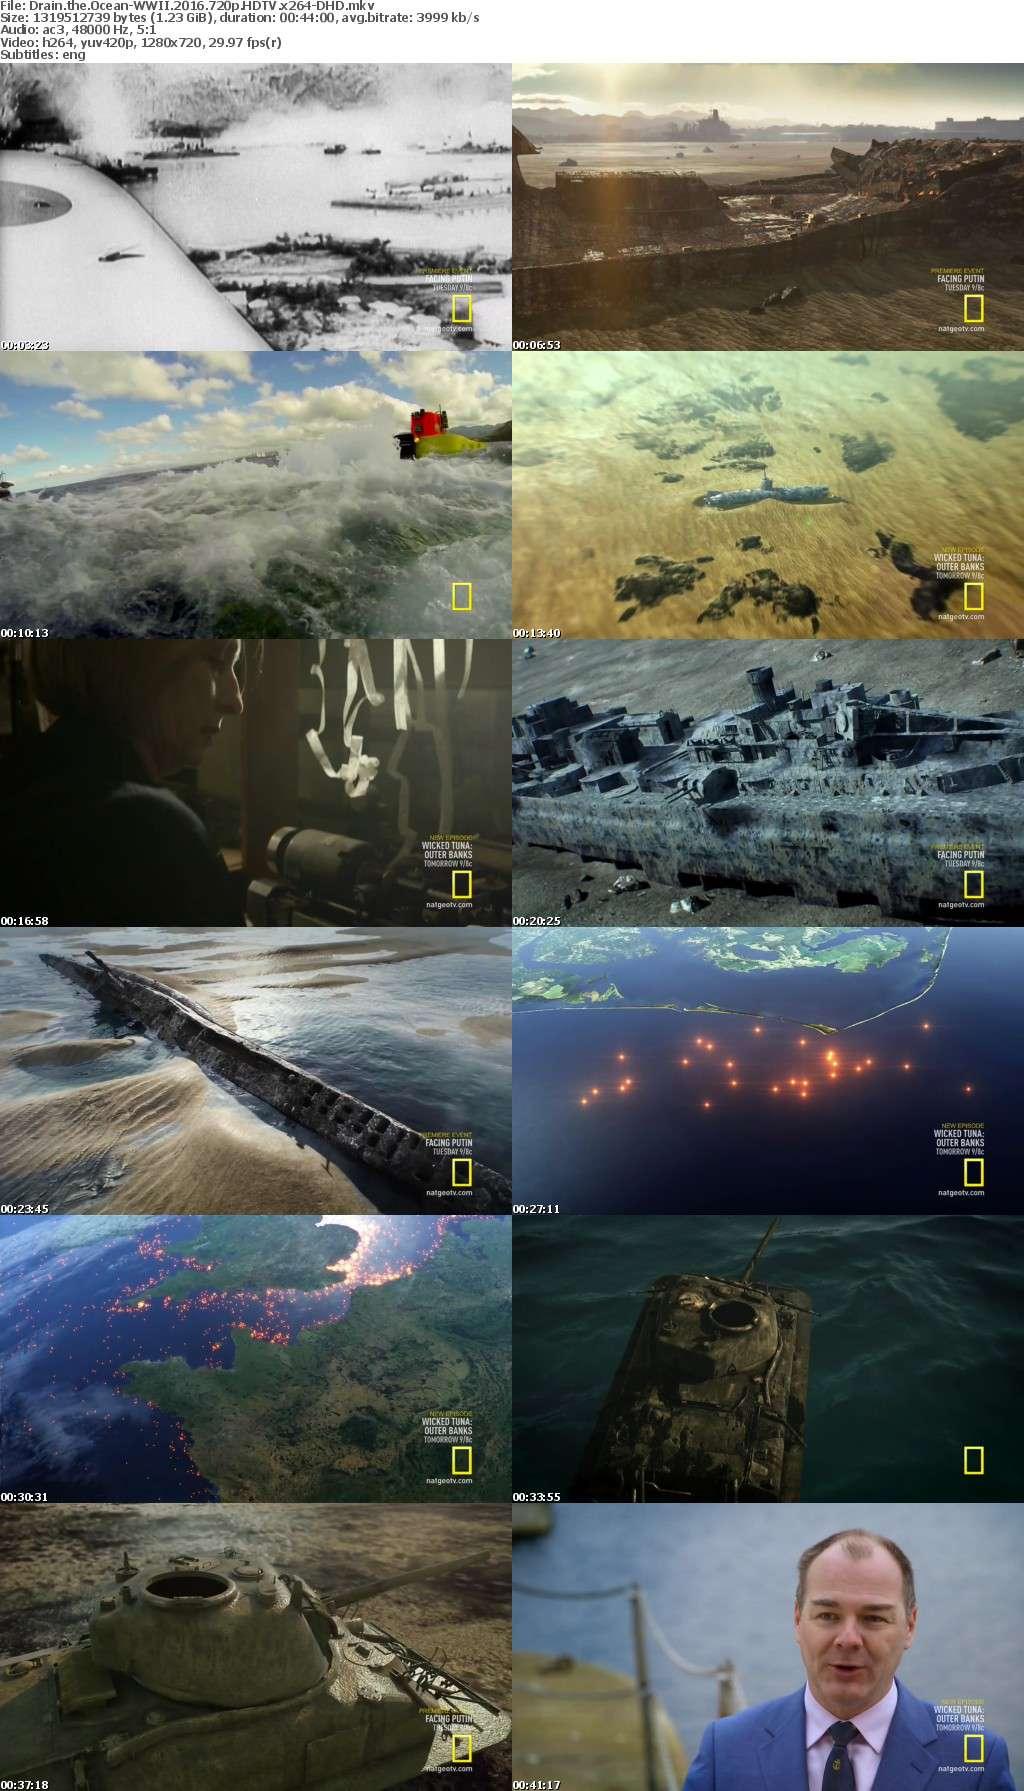 Drain the Ocean-WWII 2016 720p HDTV x264-DHD